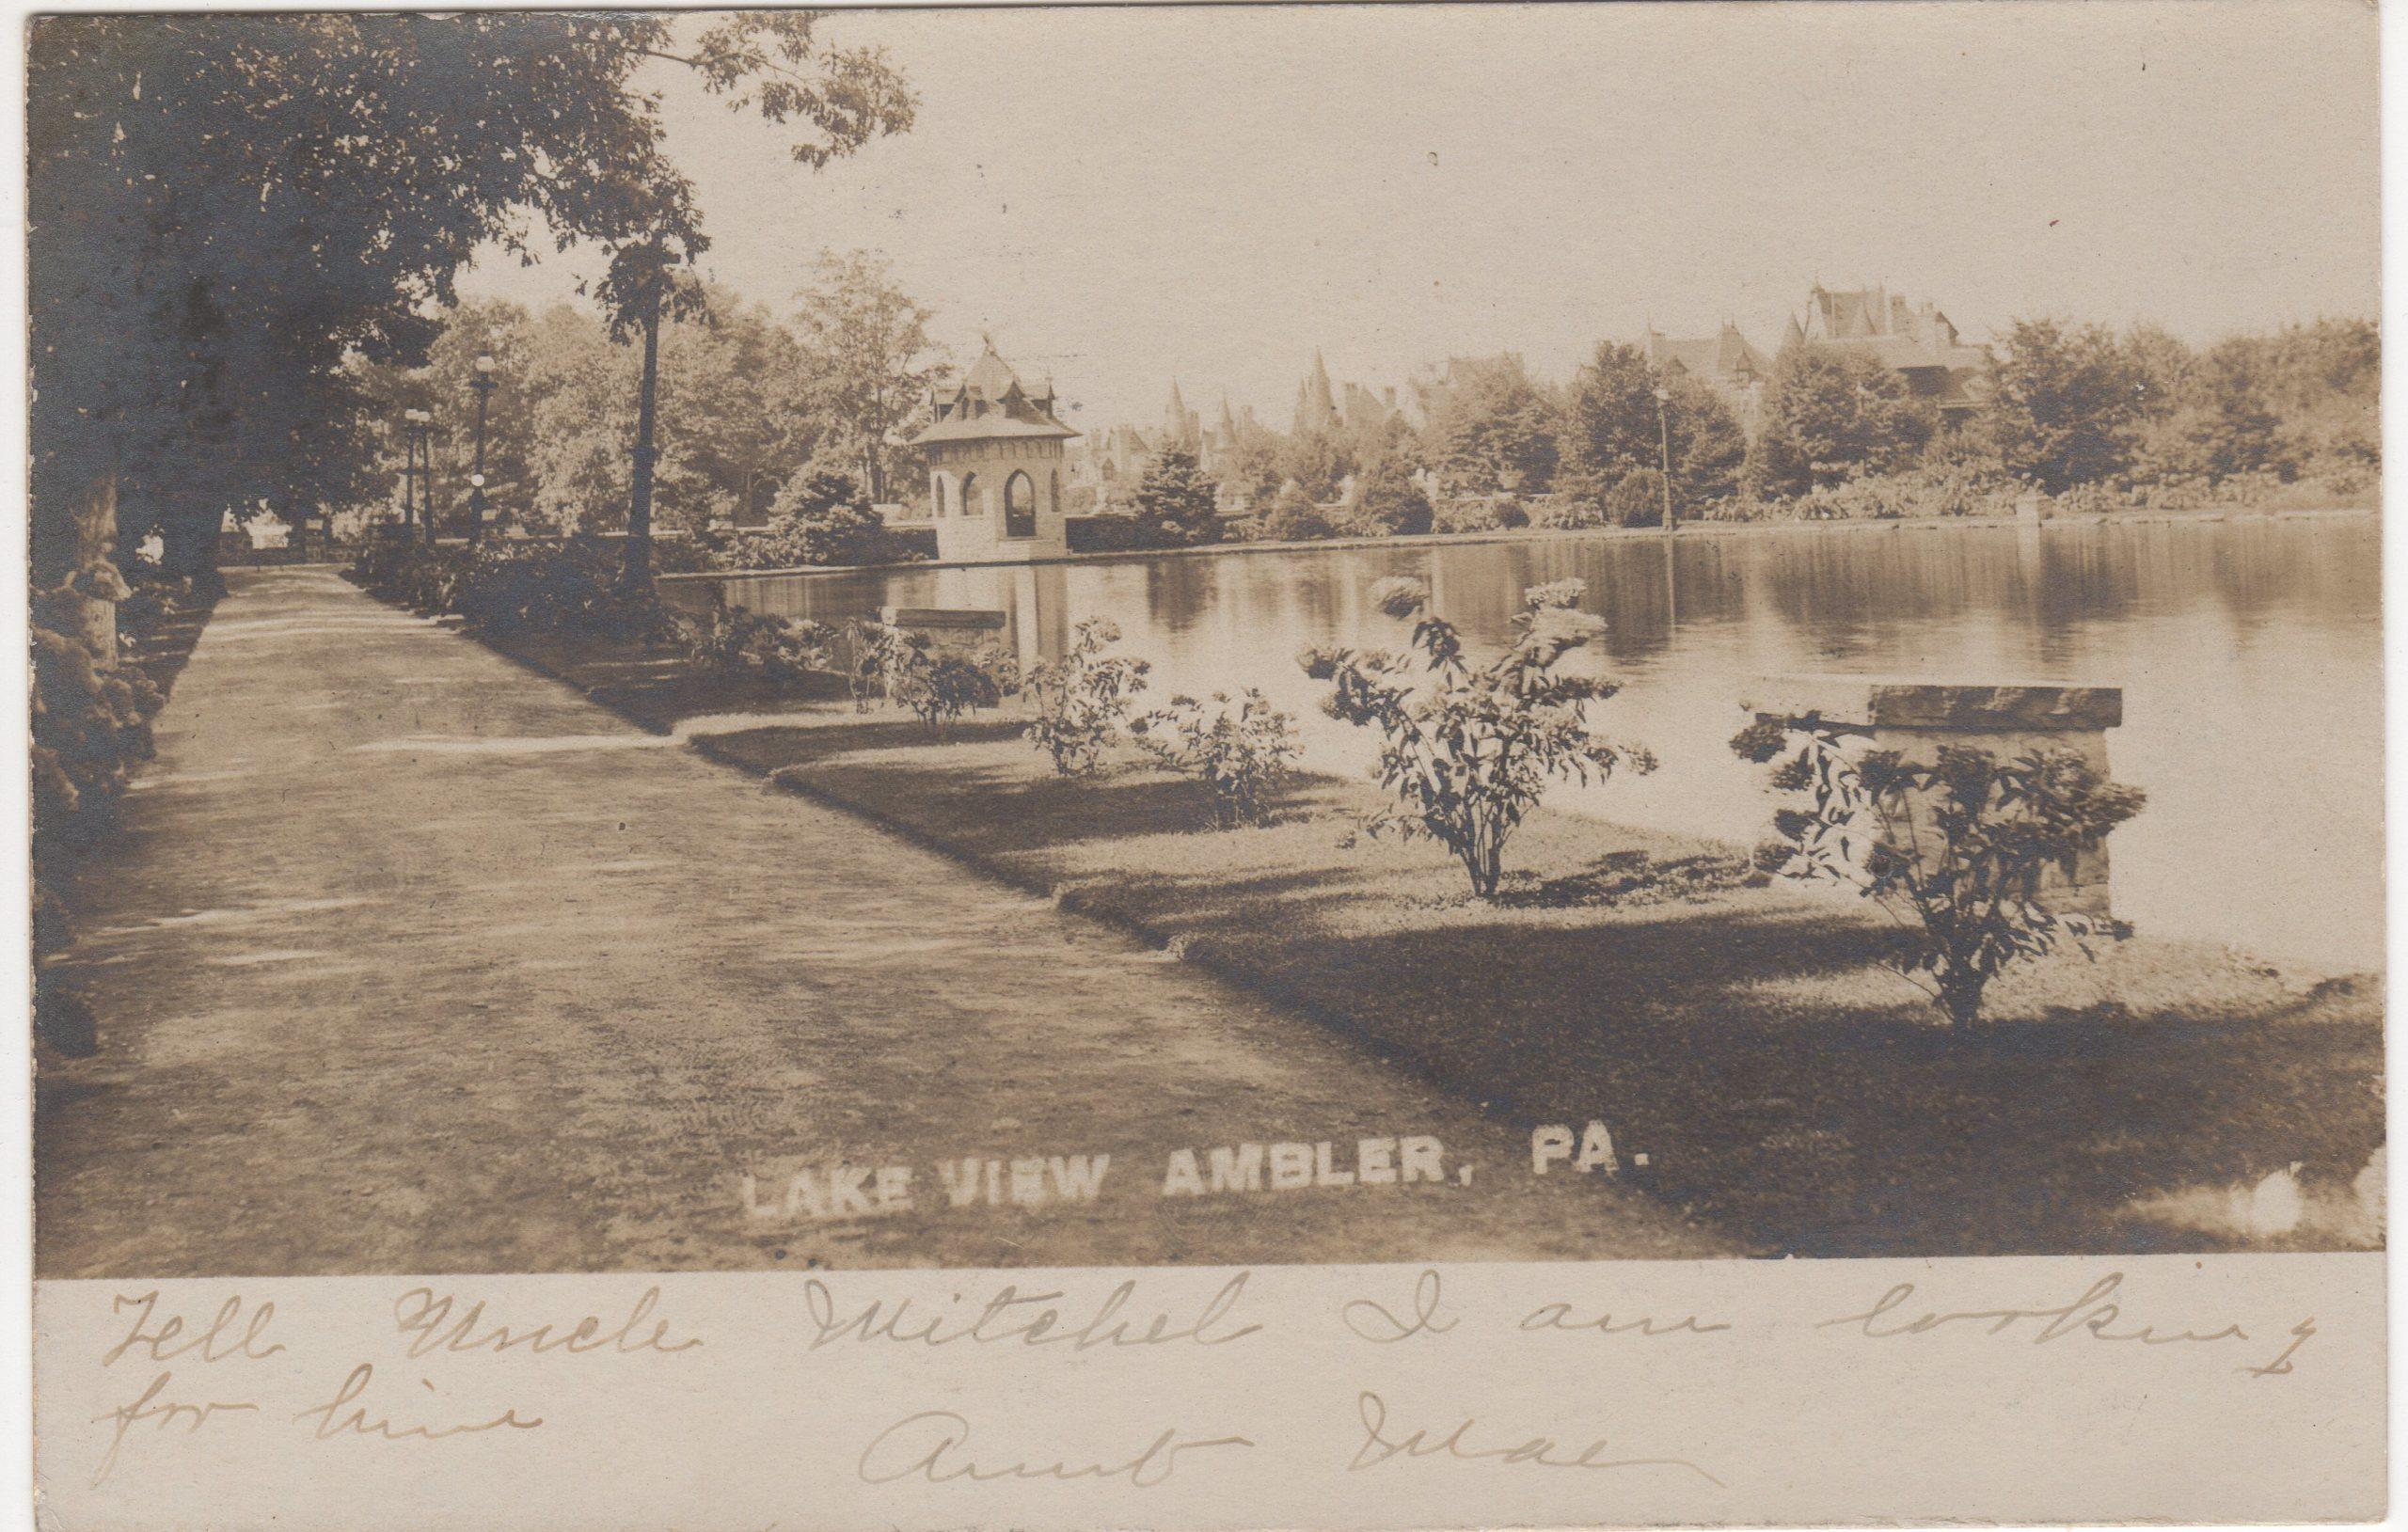 4125.103 Ambler Pa Postcard_Loch Linden_circa 1907 (2)